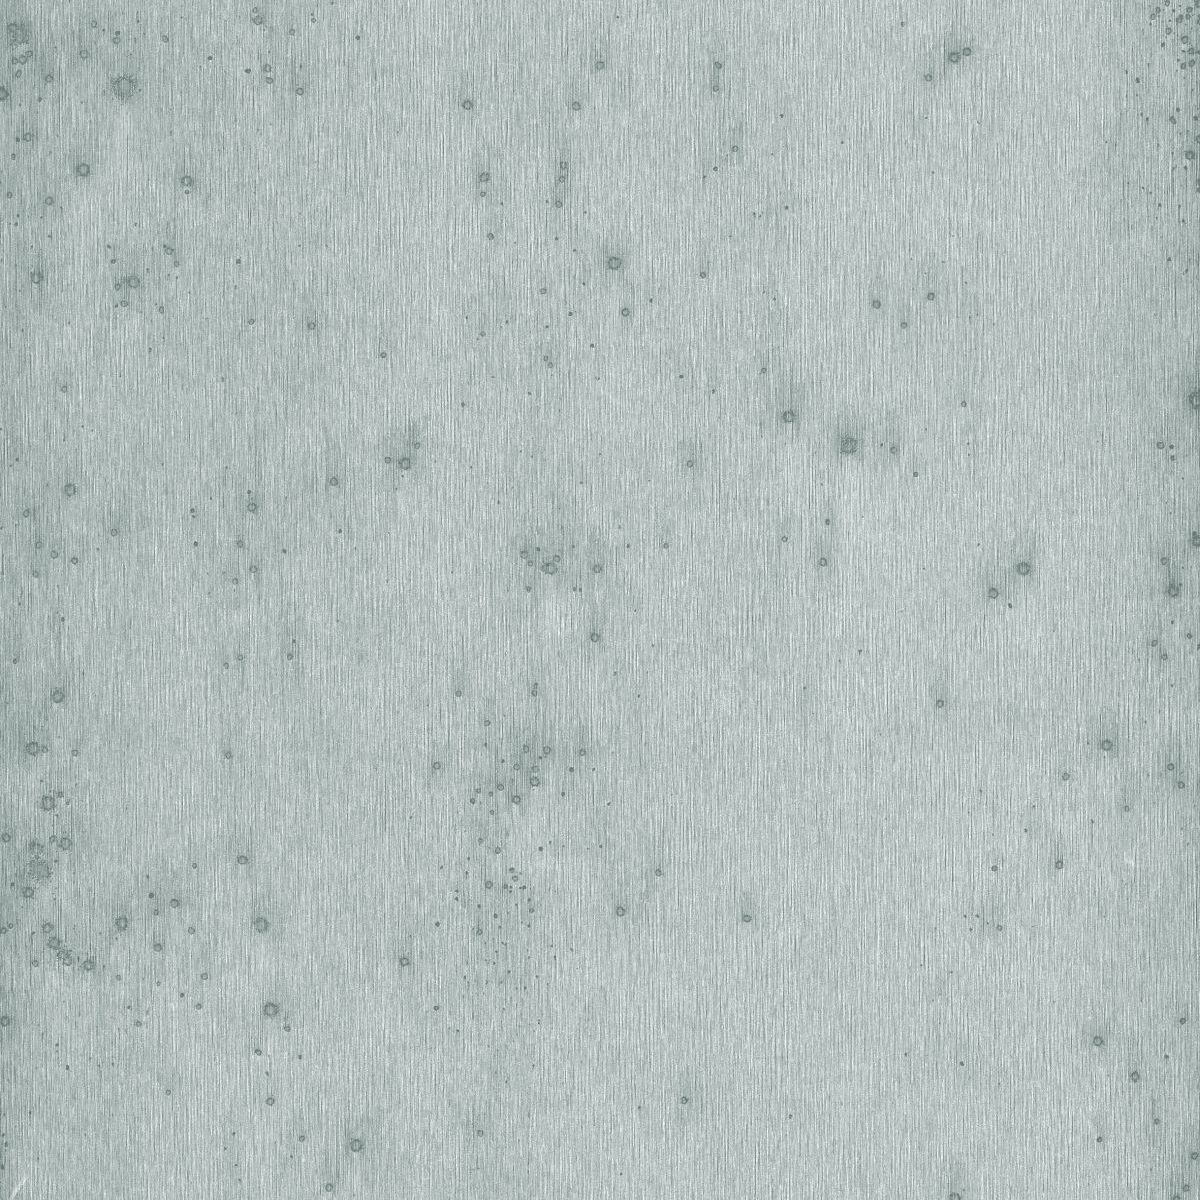 Amazing Wallpaper High Quality Marble - Metallics_Tapete_37502G  Snapshot_104567.jpg